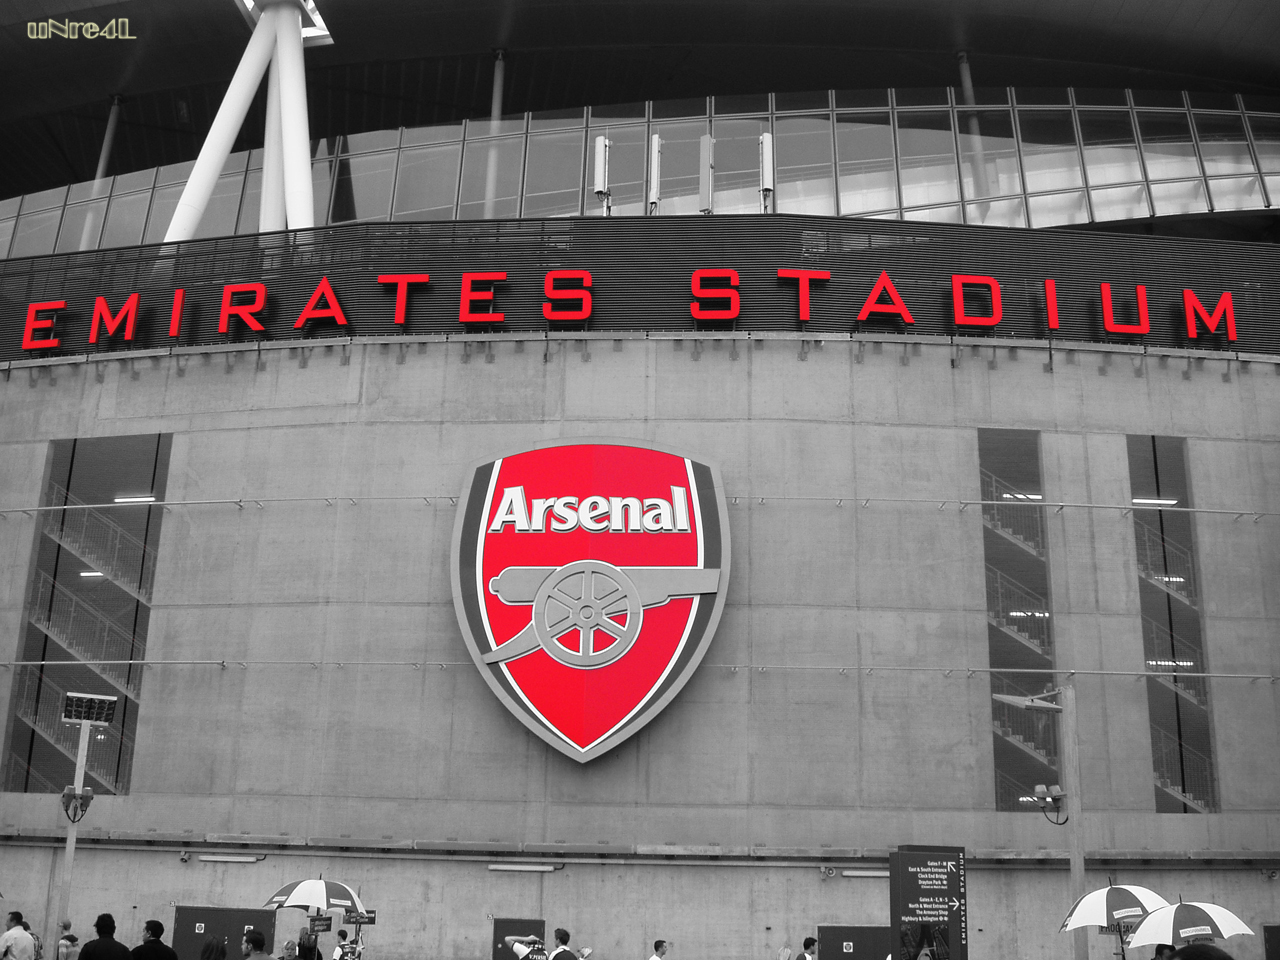 Emirates Stadium wallpaper Football Pictures and Photos 1280x960